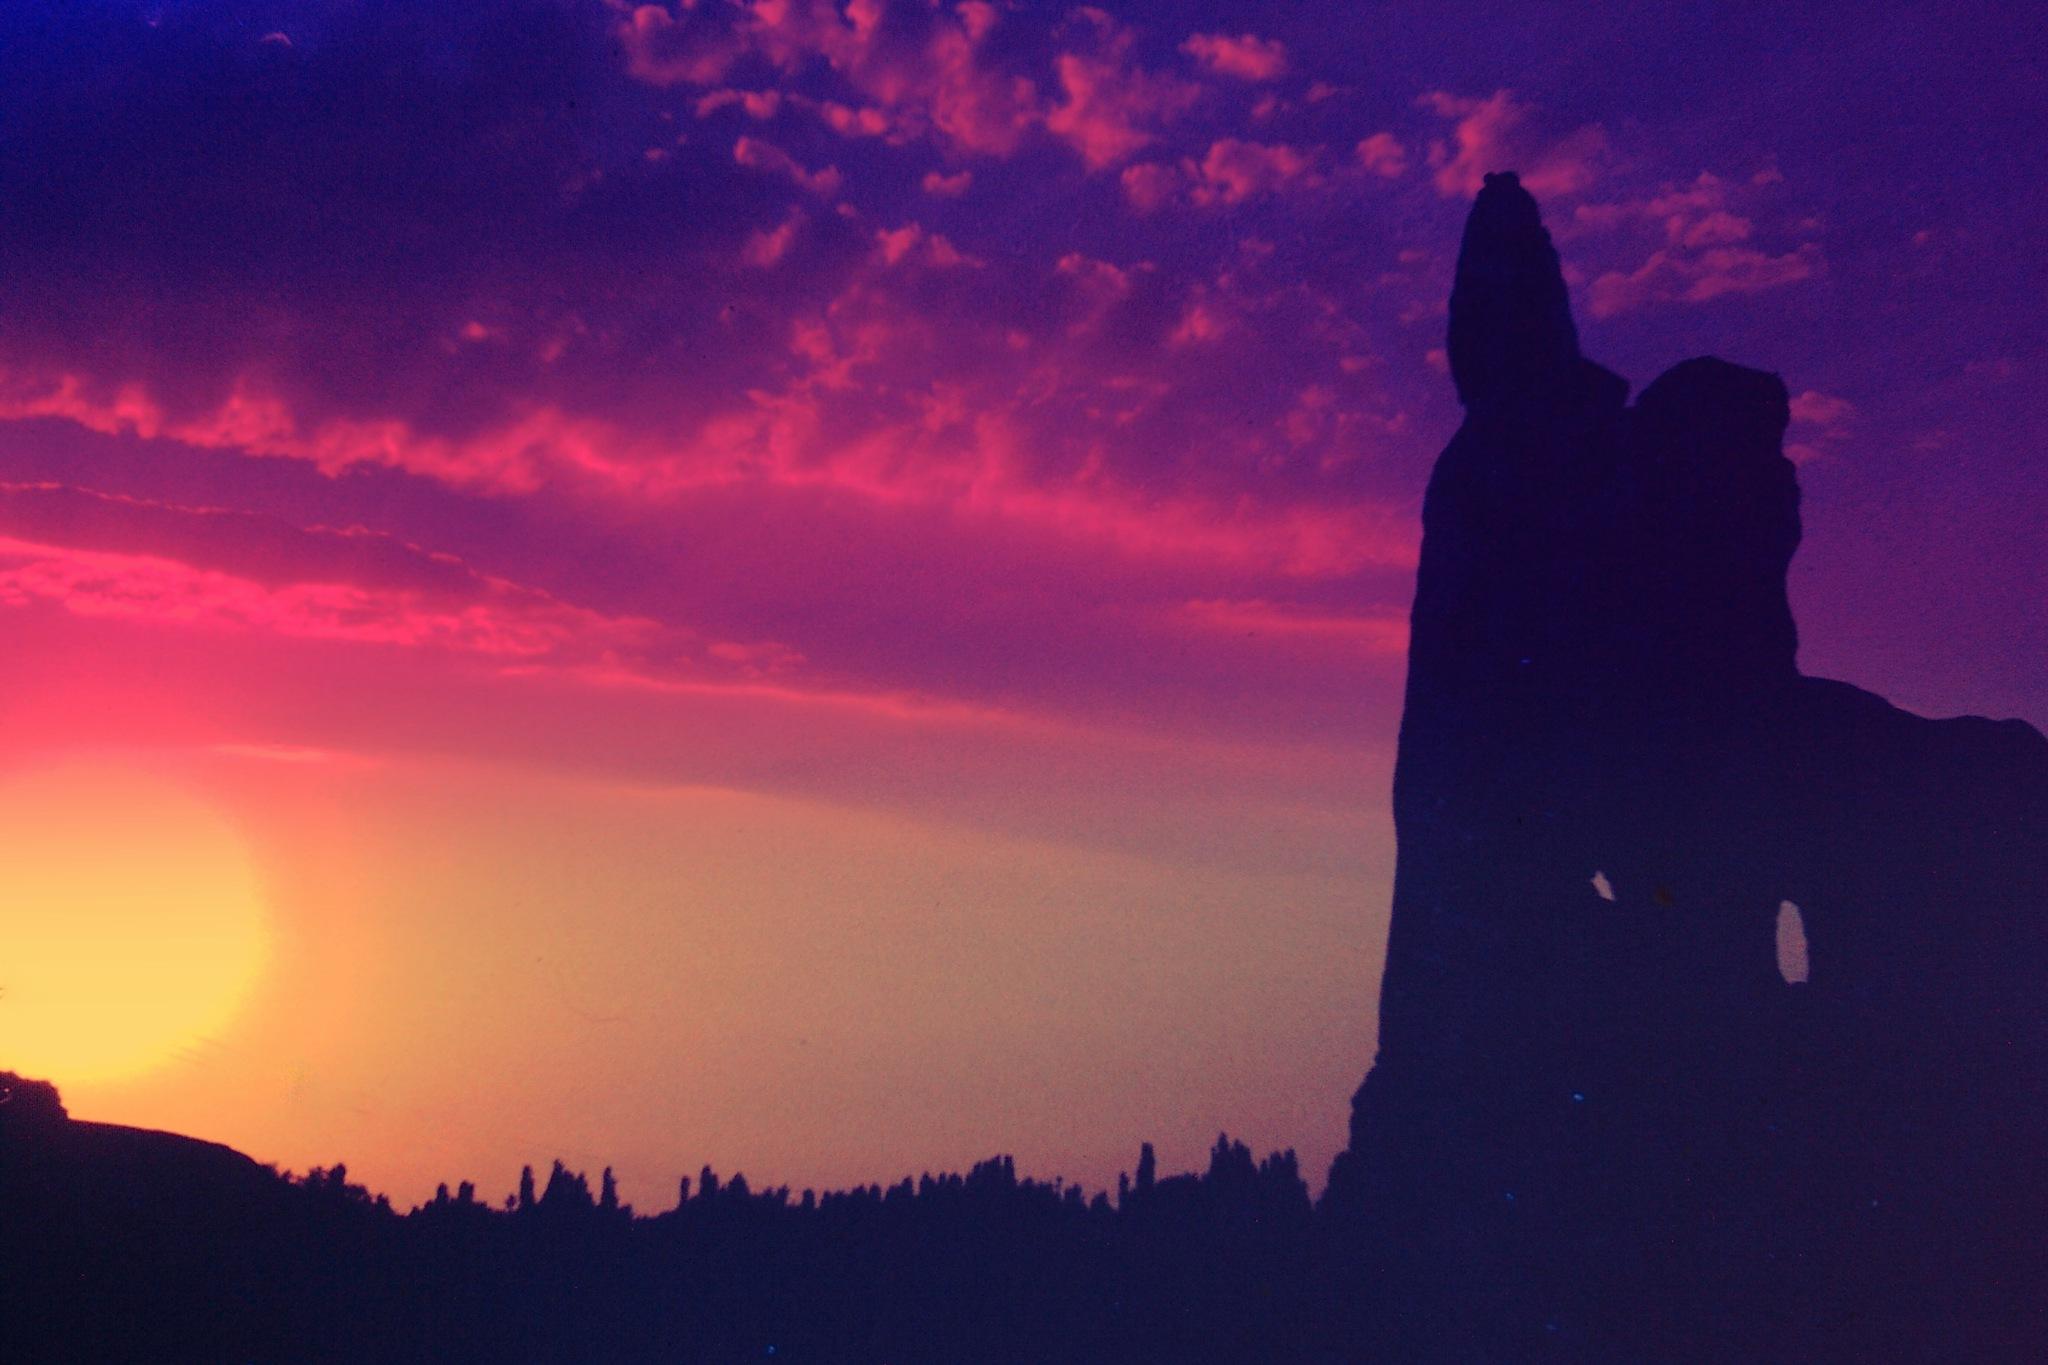 THE SUN SETS BEHIND FAIRY CHIMNEYS, CAPPADOCIA by Akin Saner